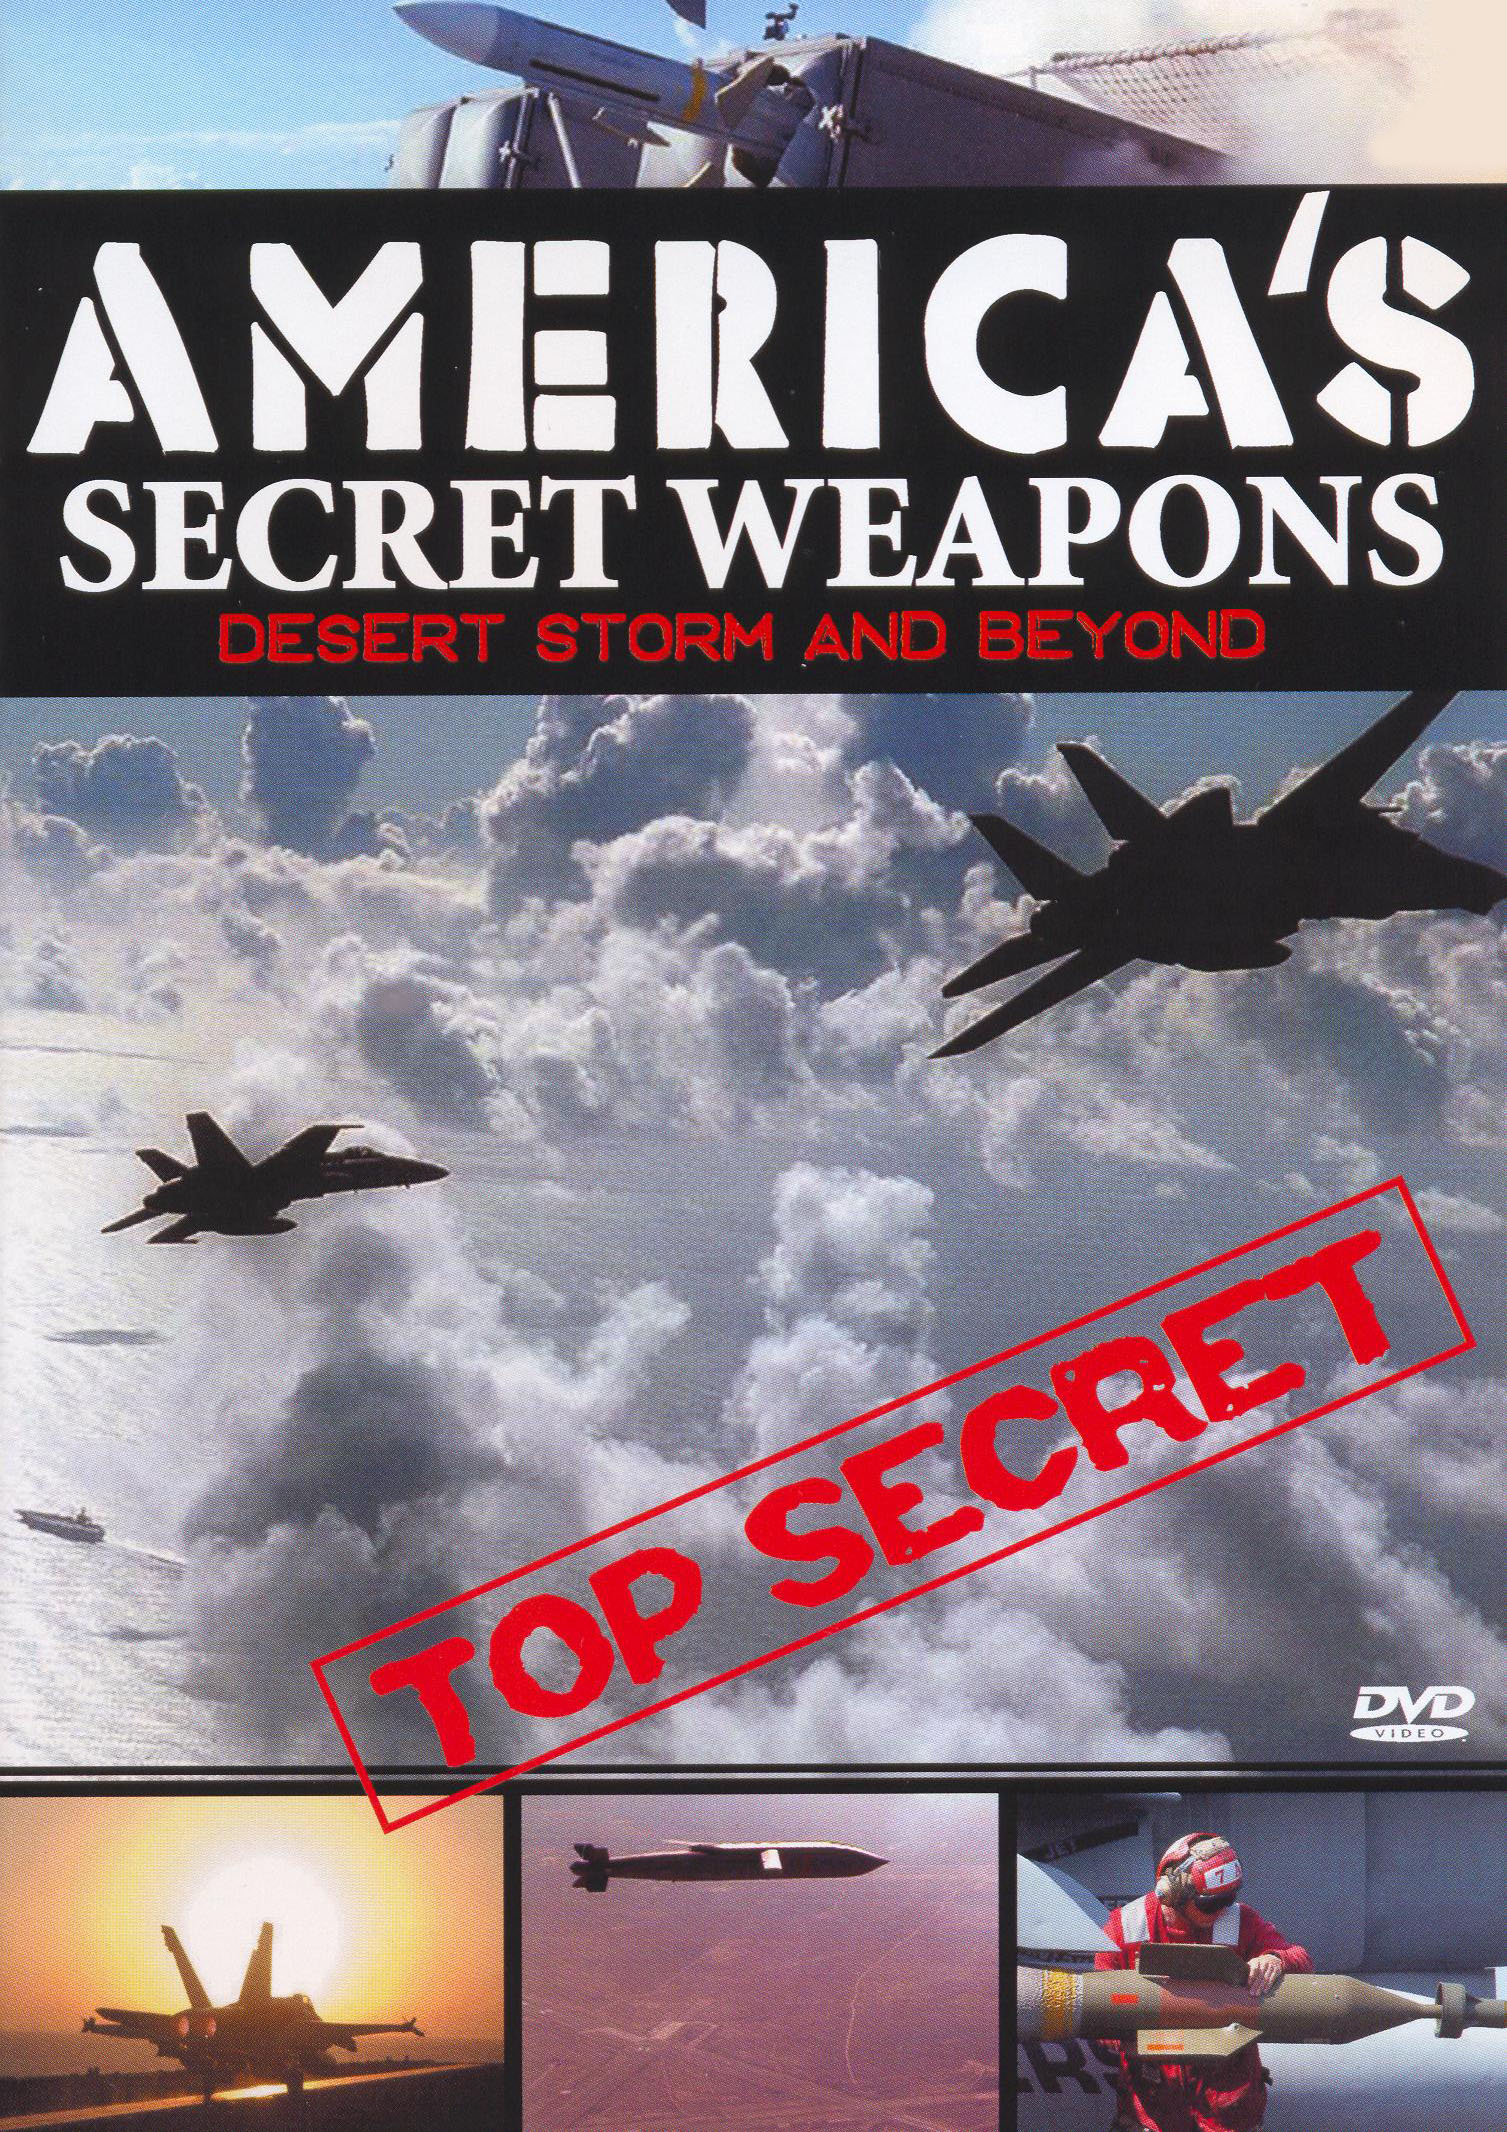 America's Secret Weapons: Desert Storm and Beyond